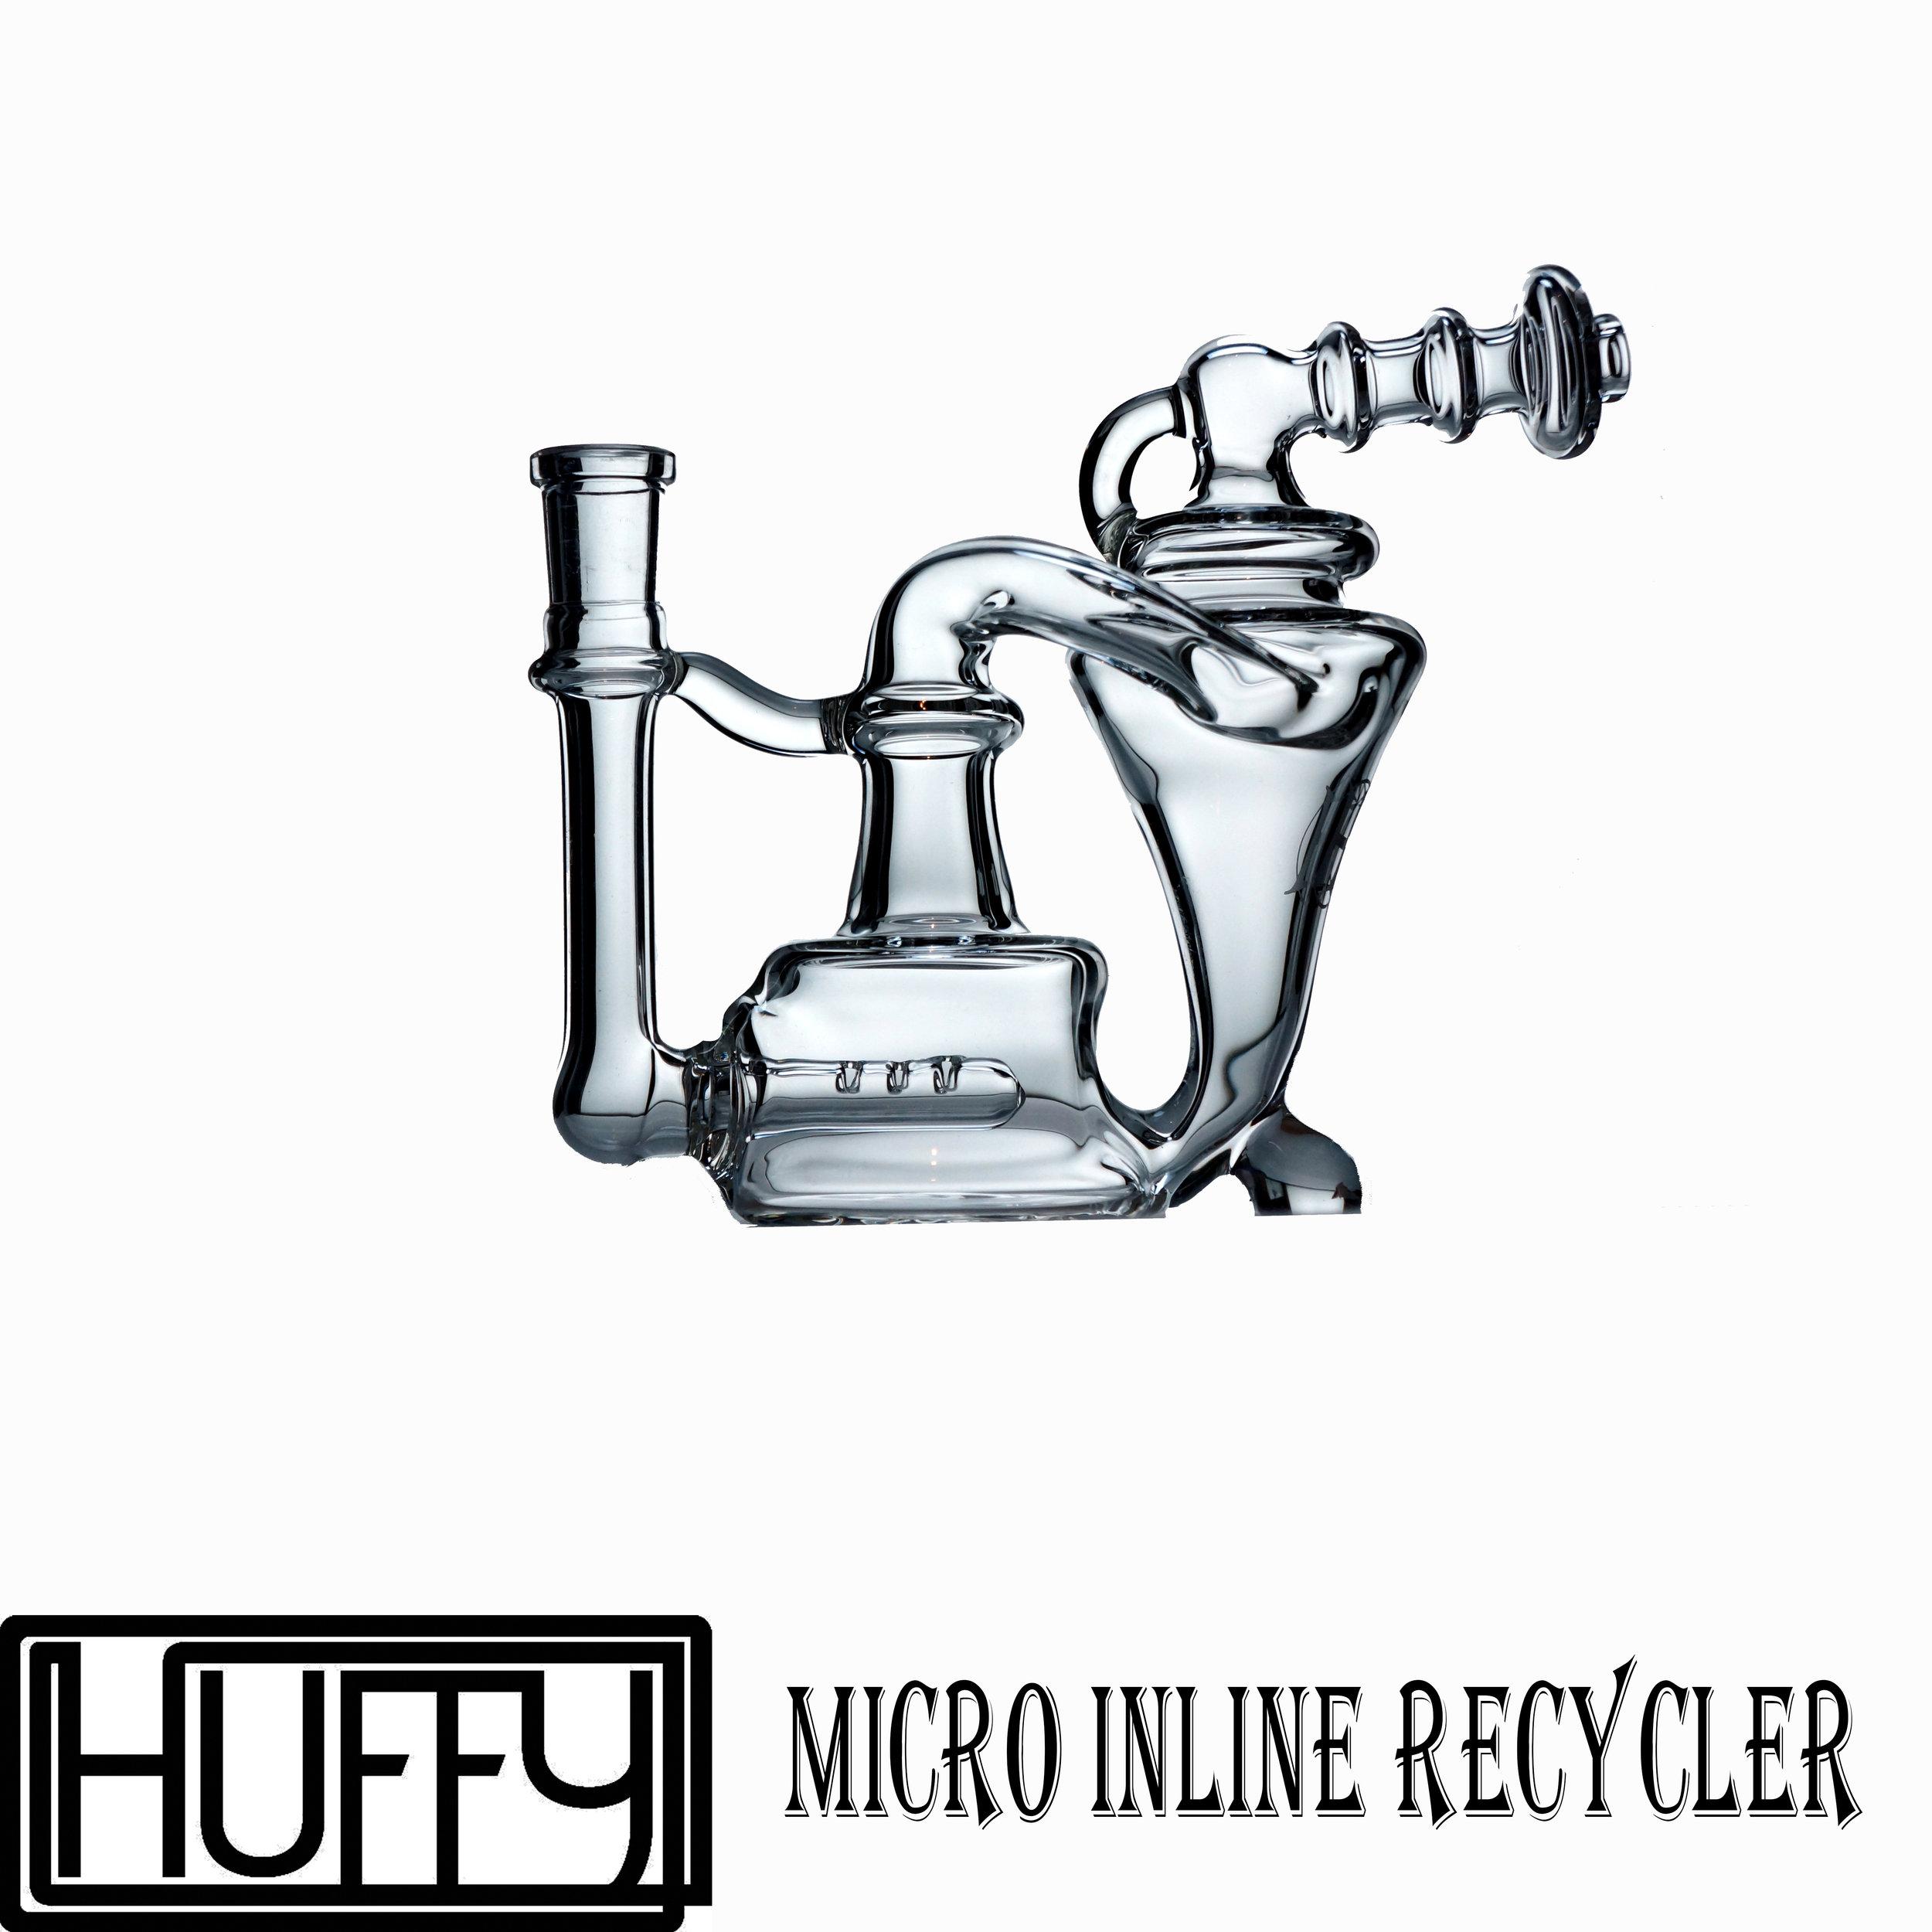 MICRO INLINE W.jpg